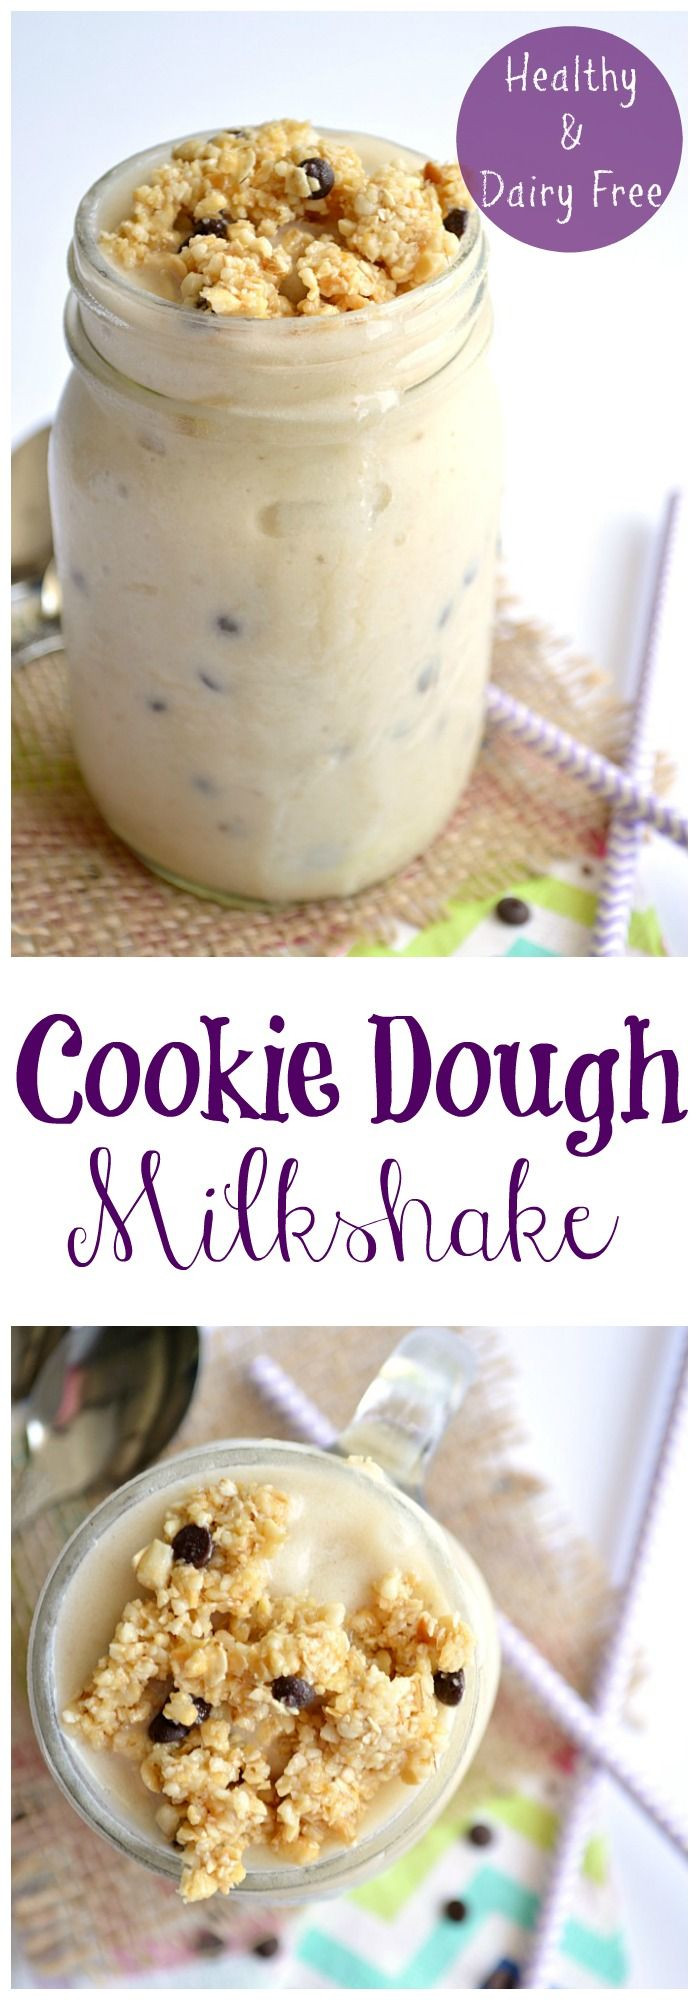 Healthy Dairy Free Desserts  Cookie Dough Milkshake Healthy & Dairy Free